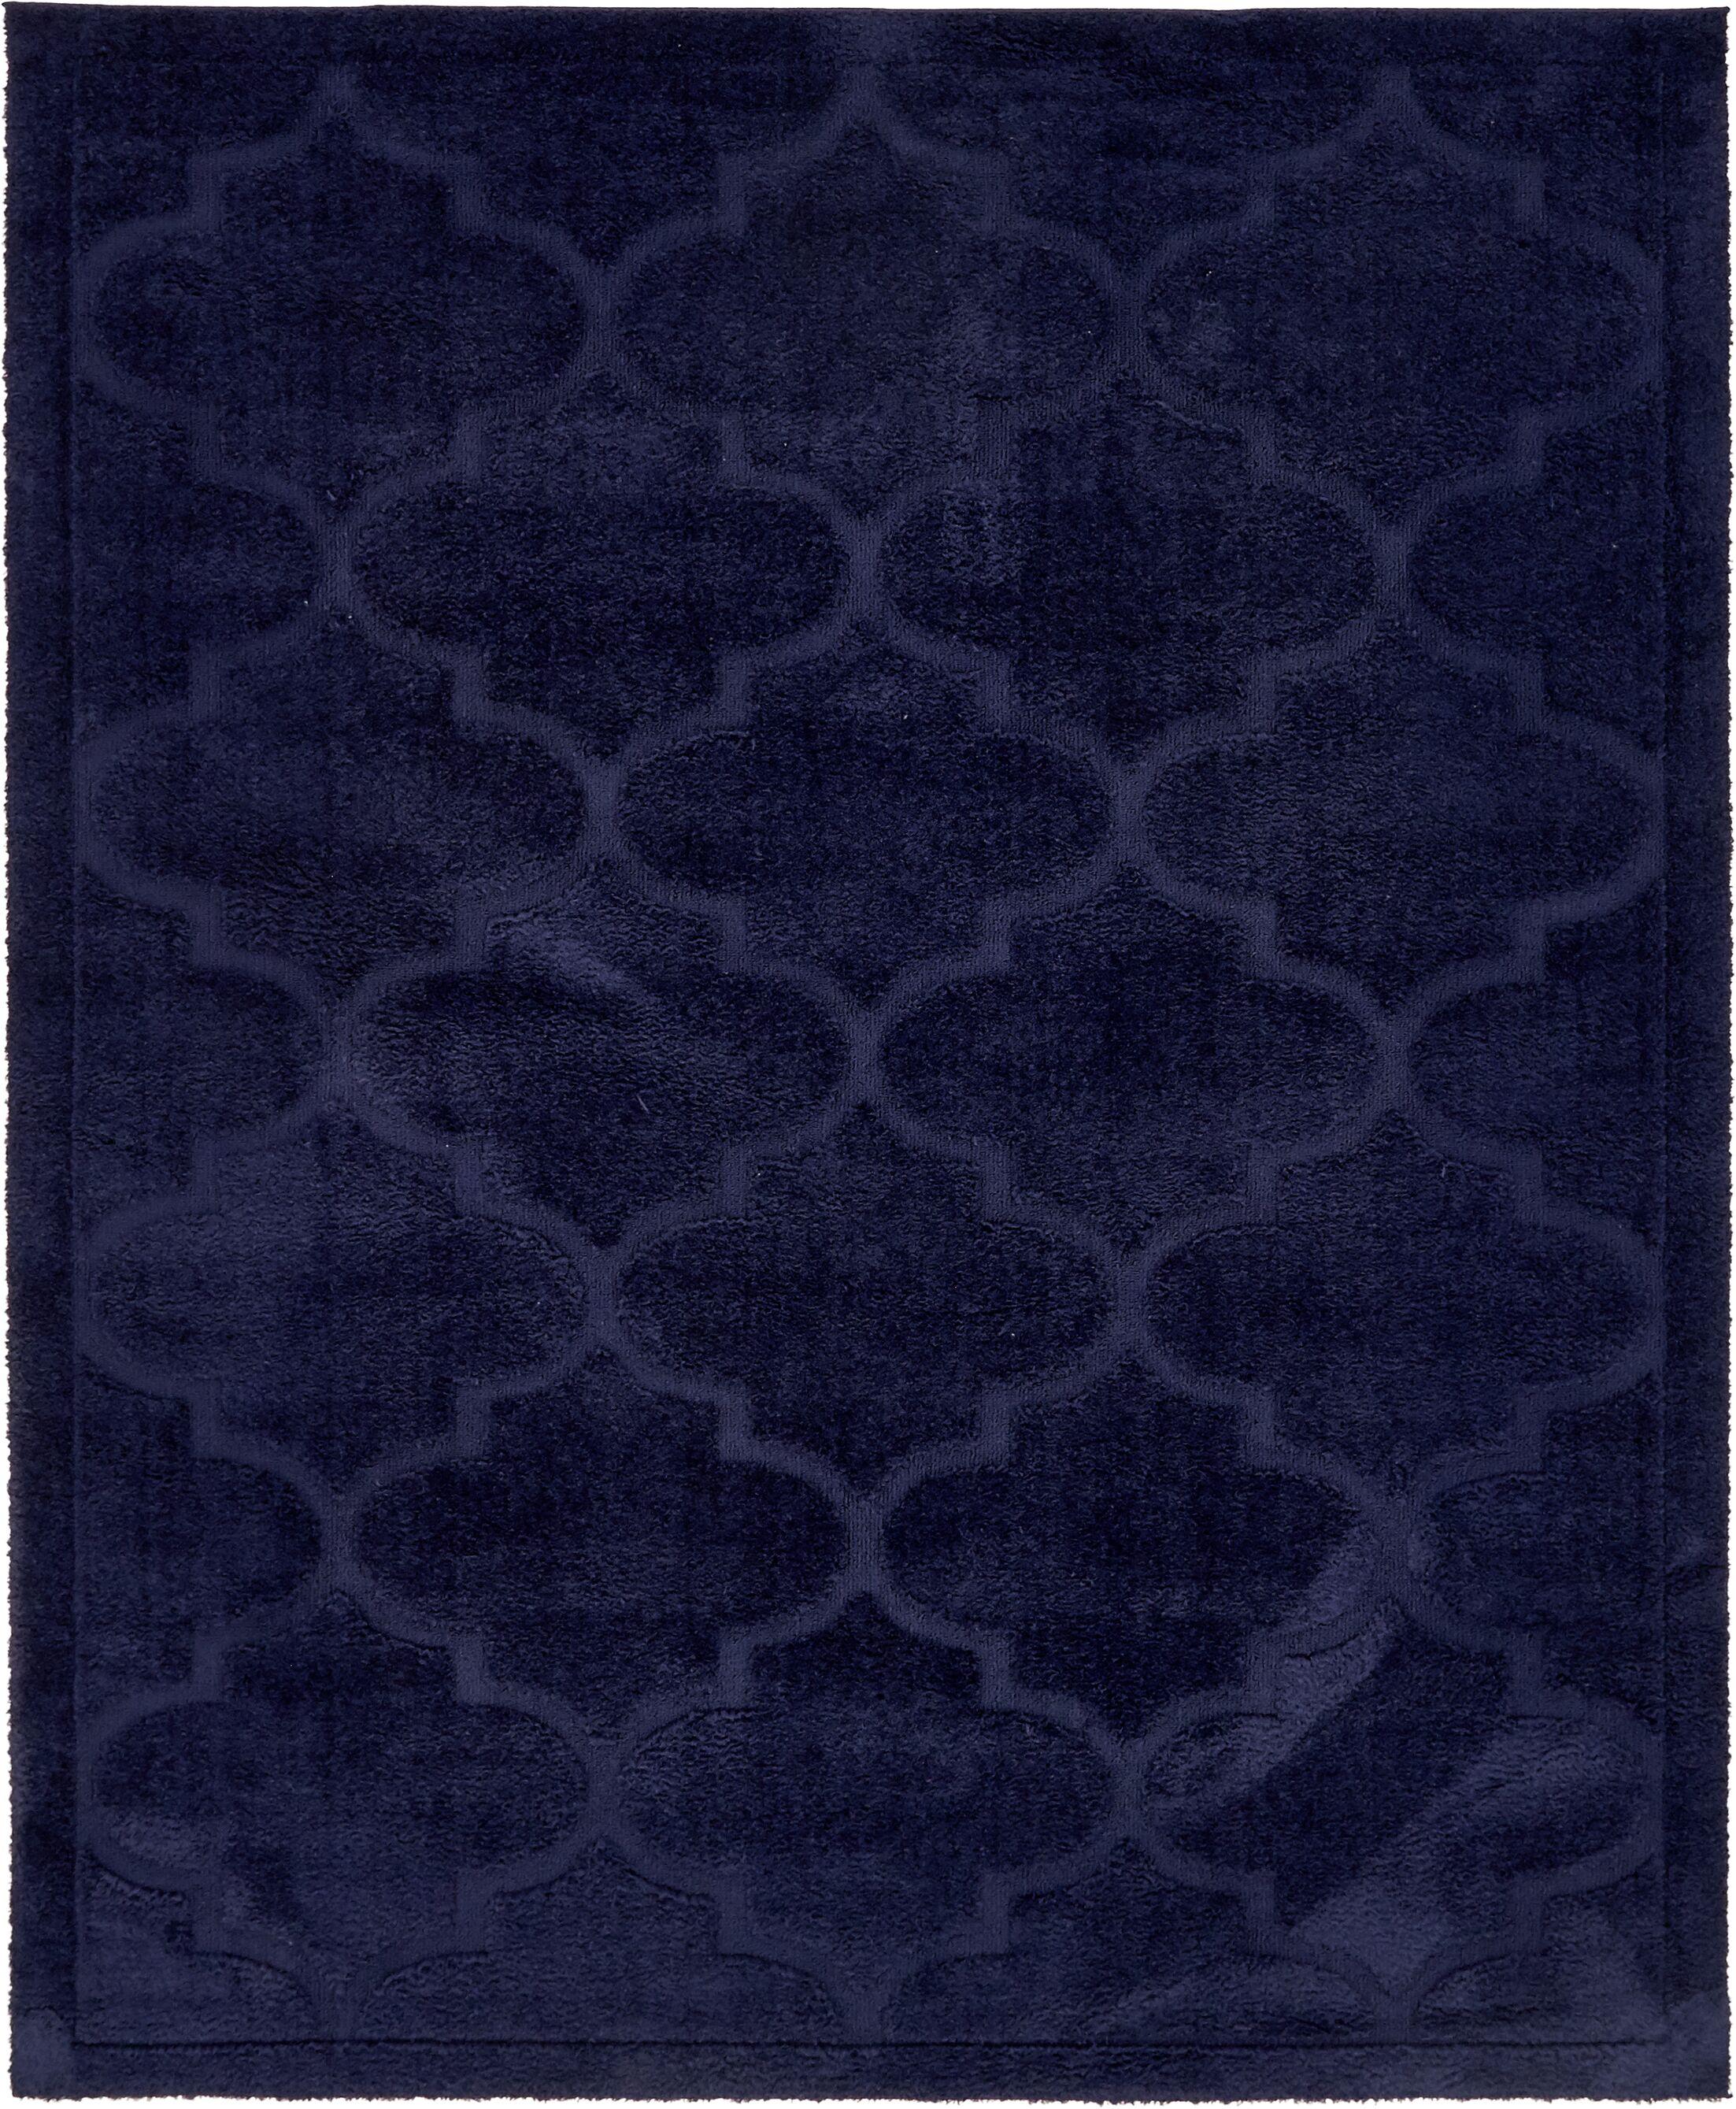 Millvale Navy Blue Area Rug Rug Size: Rectangle 8' x 10'